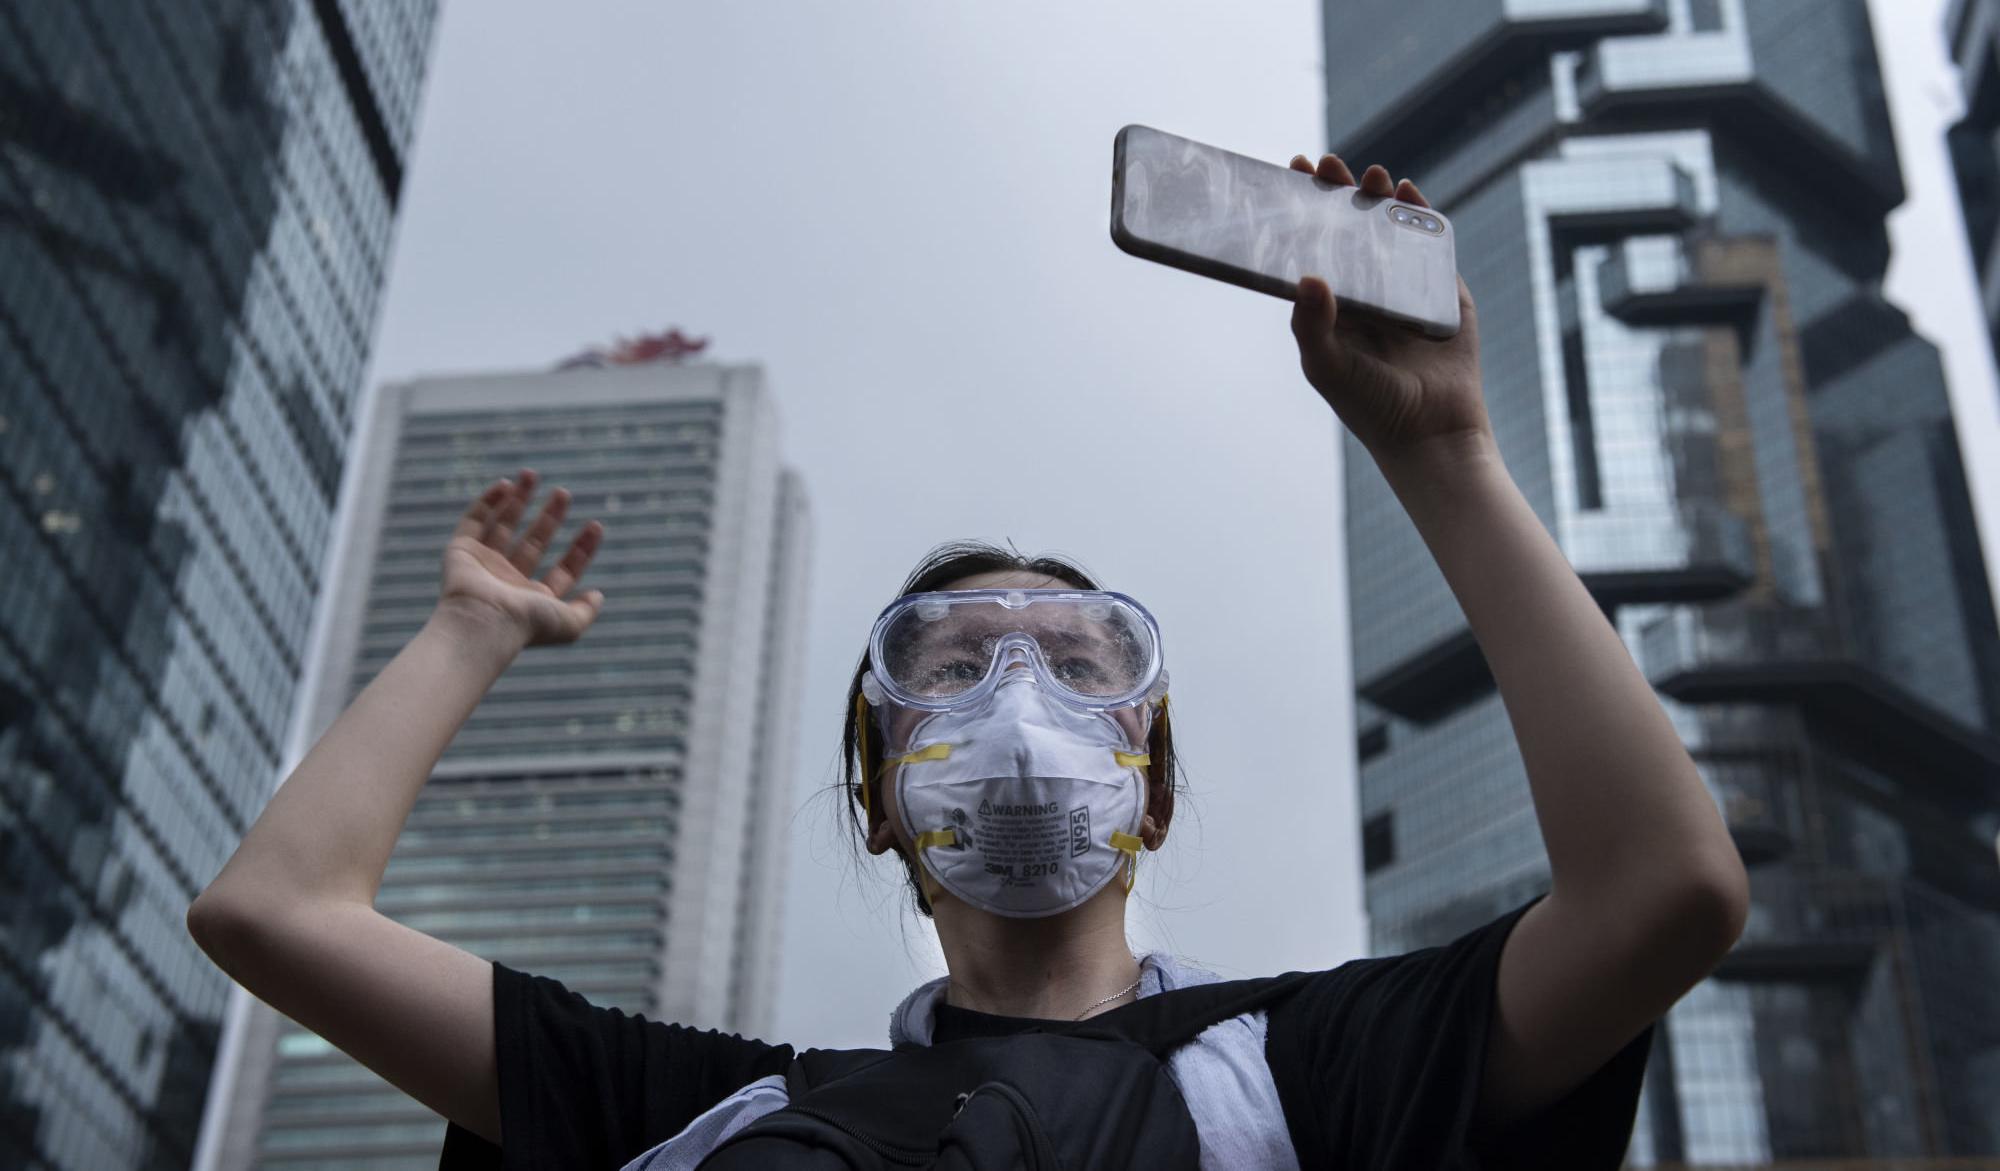 Китай объявил войну мессенджеру Telegram